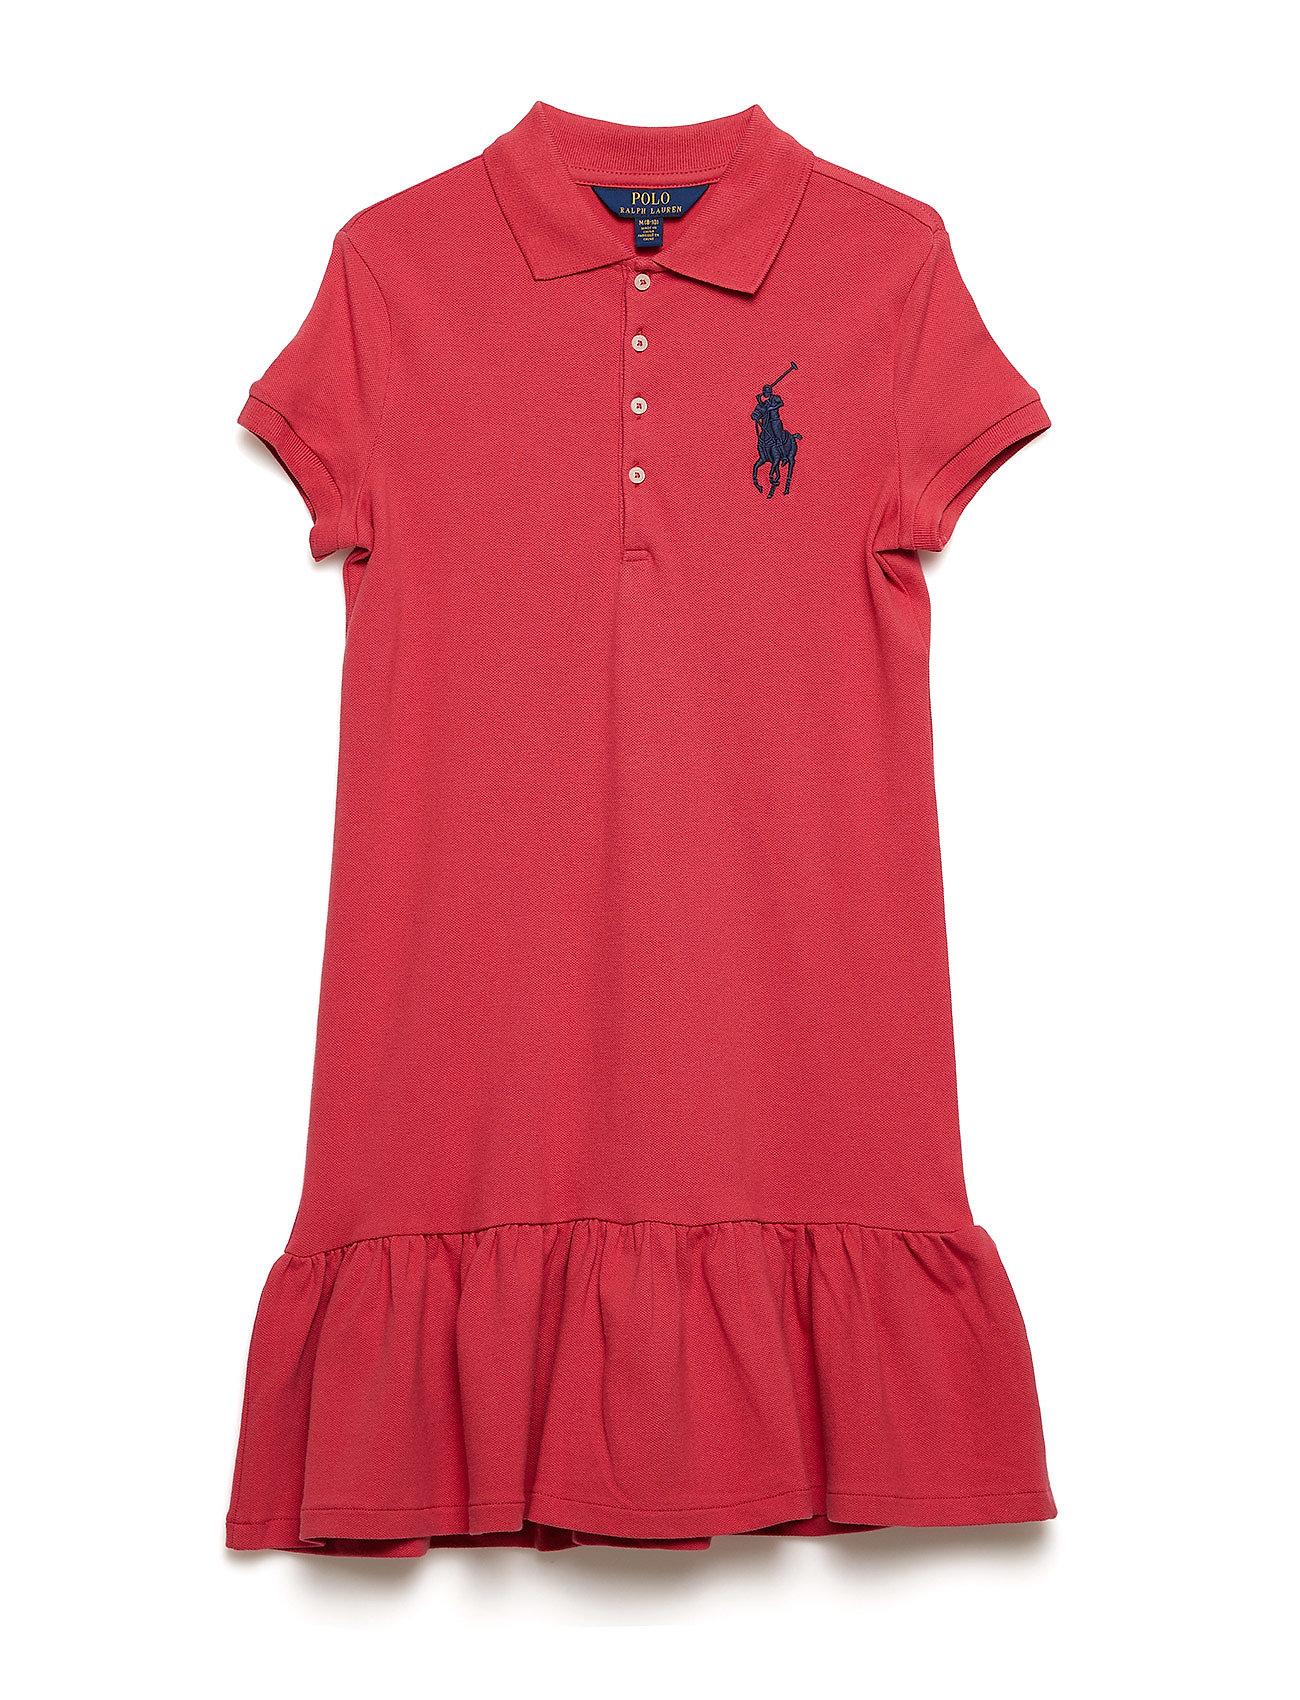 6766fbbfd Big Pony Mesh Polo Dress (Nantucket Red) (£41.25) - Ralph Lauren ...